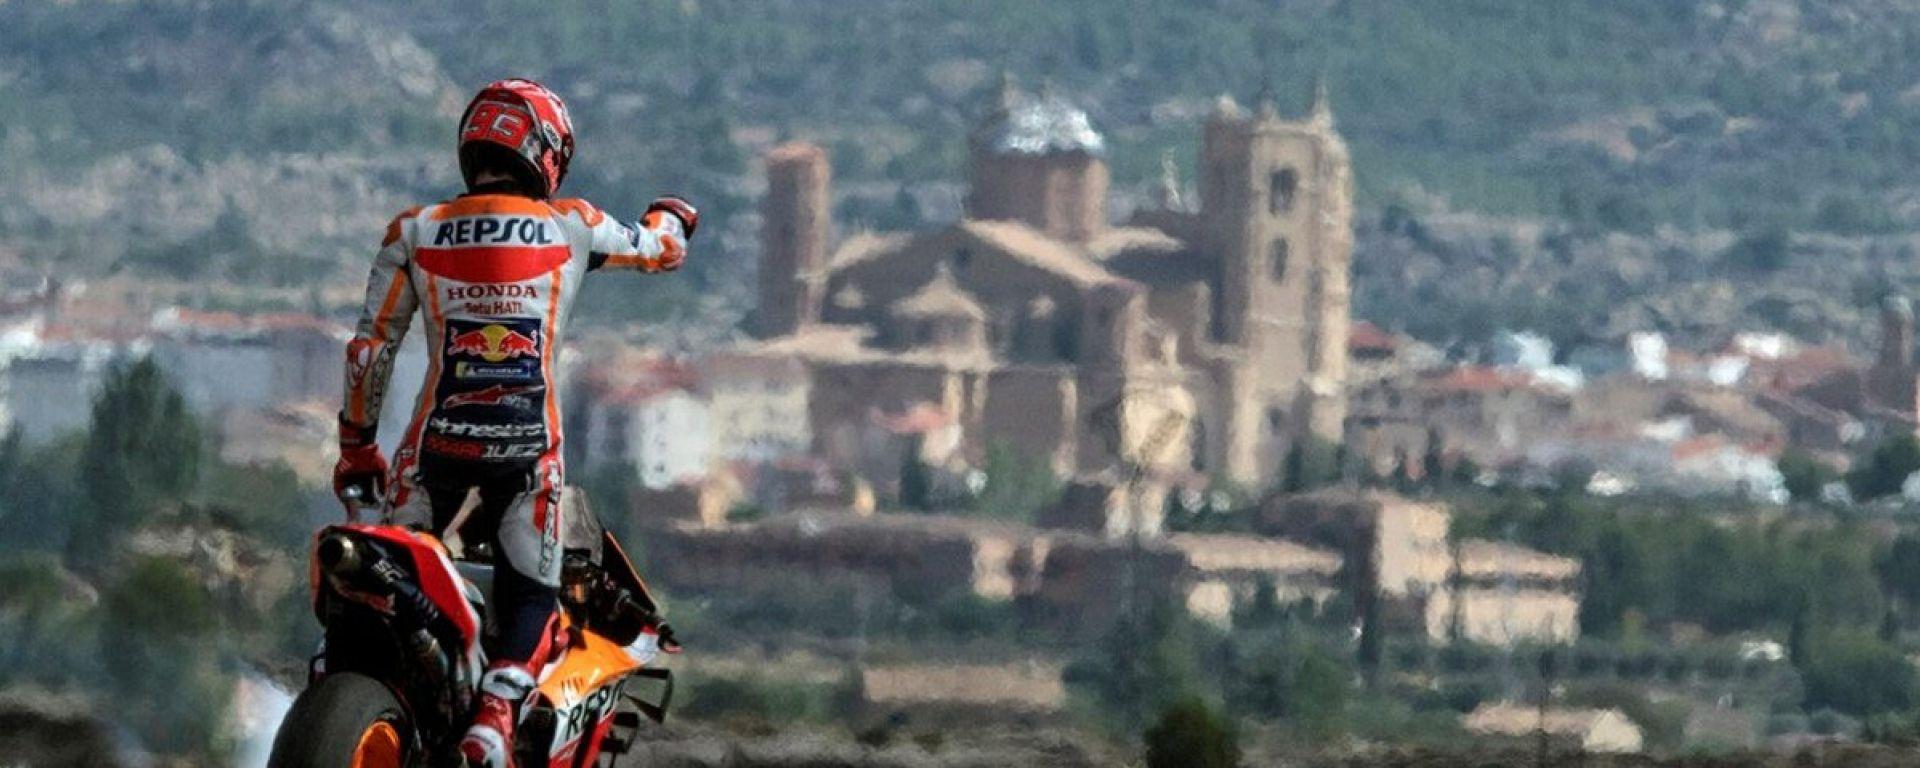 Marc Marquez (Honda) vince il Gran Premio MotoGP di Aragona 2019